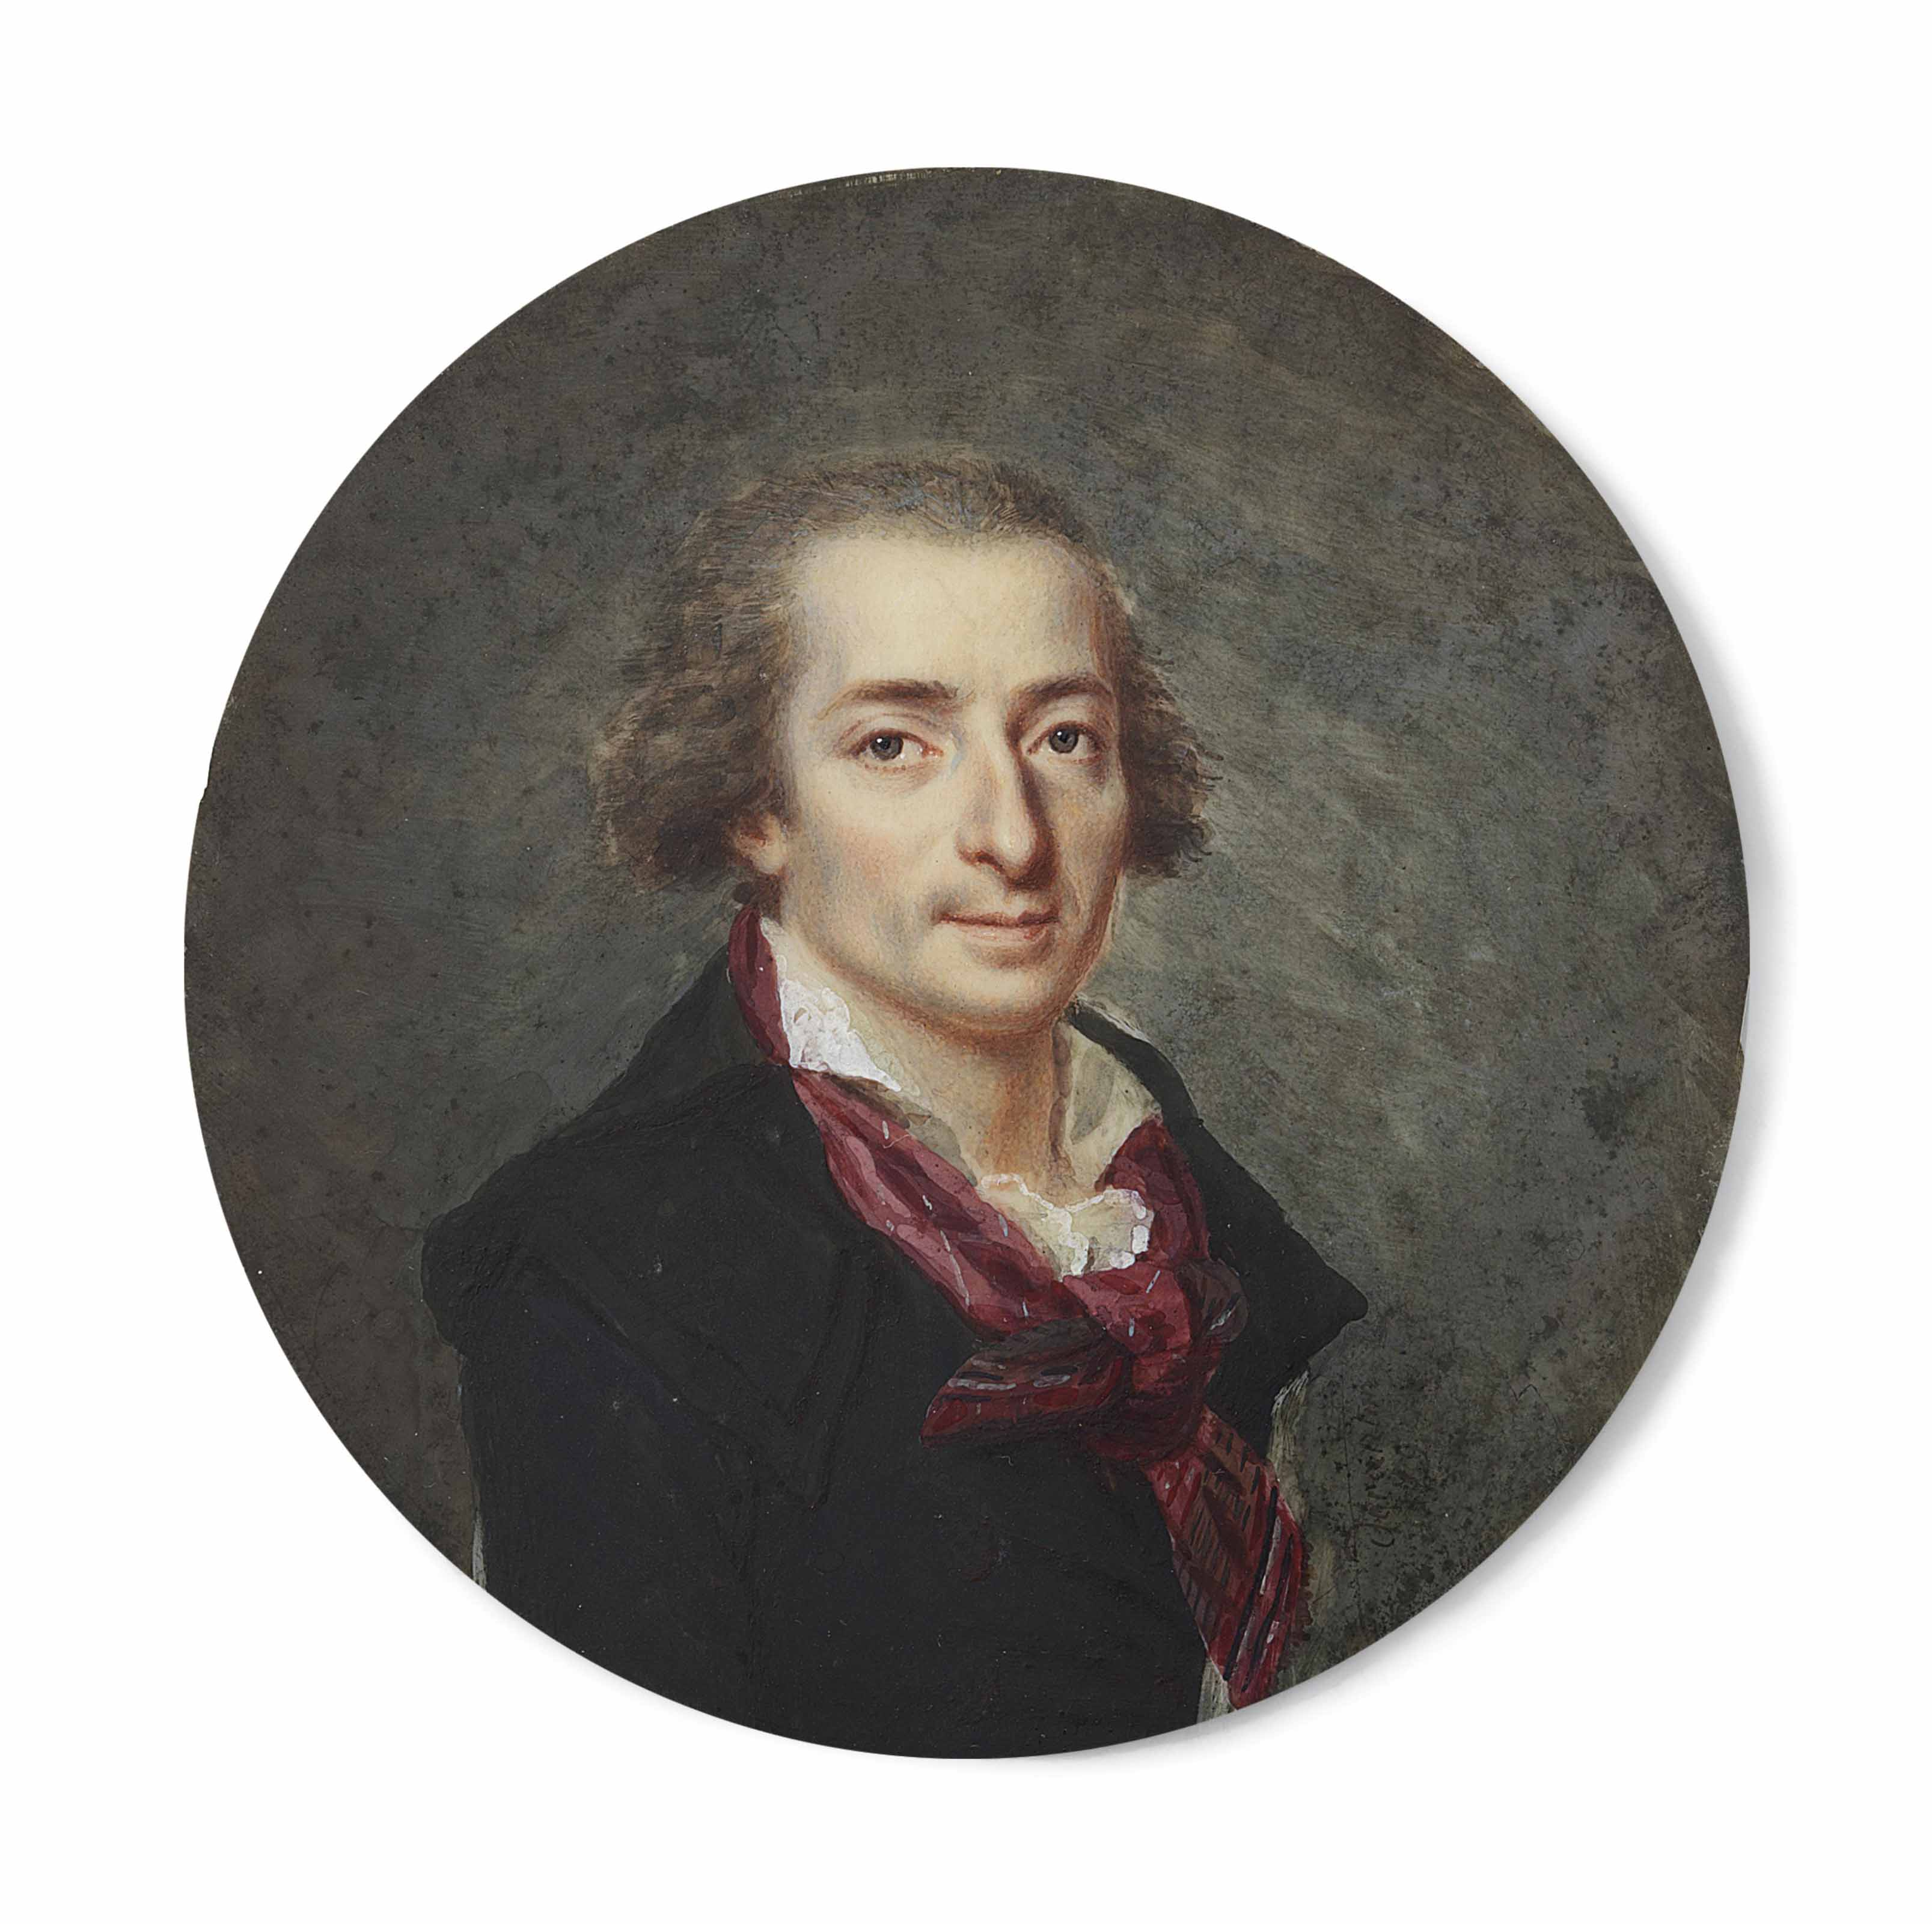 JOSEPH DERANTON (FRENCH, 1756-